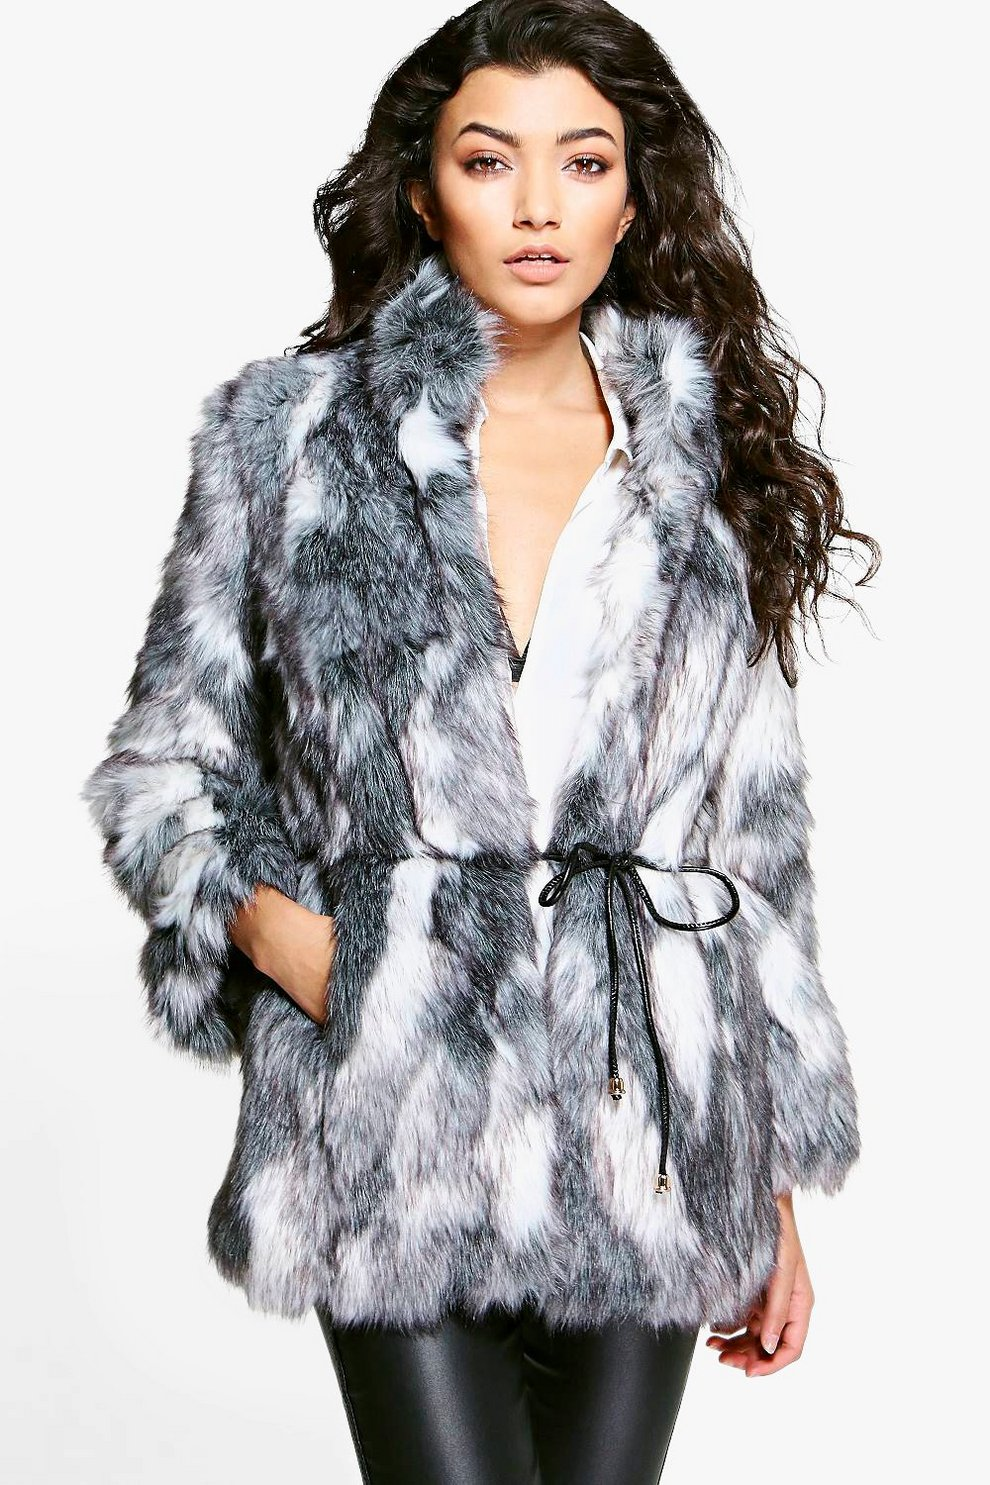 Boutique Emma Patchwork Faux Fur Coat With PU Belt | Boohoo